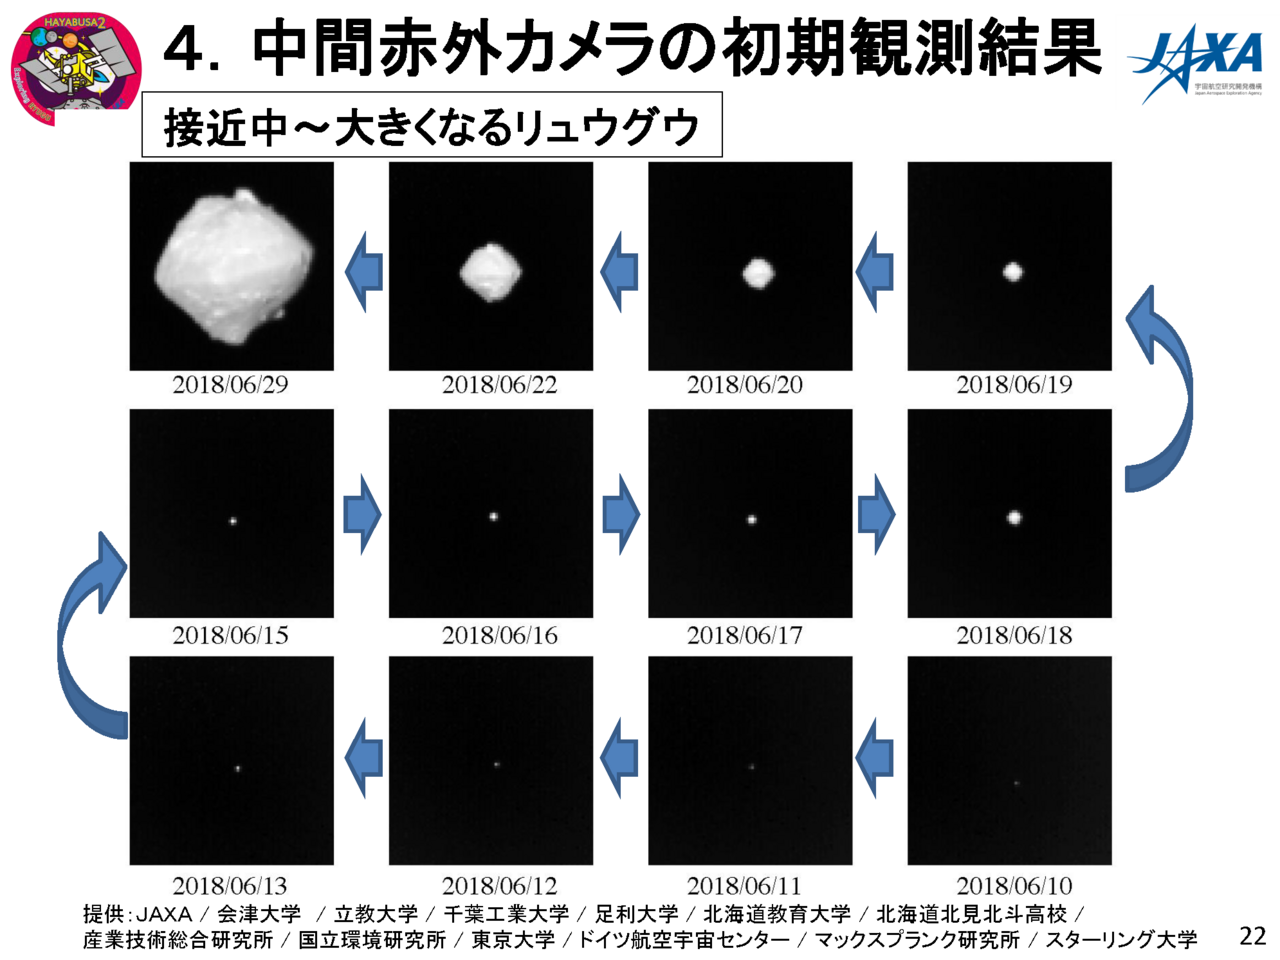 f:id:Imamura:20180719131717p:plain